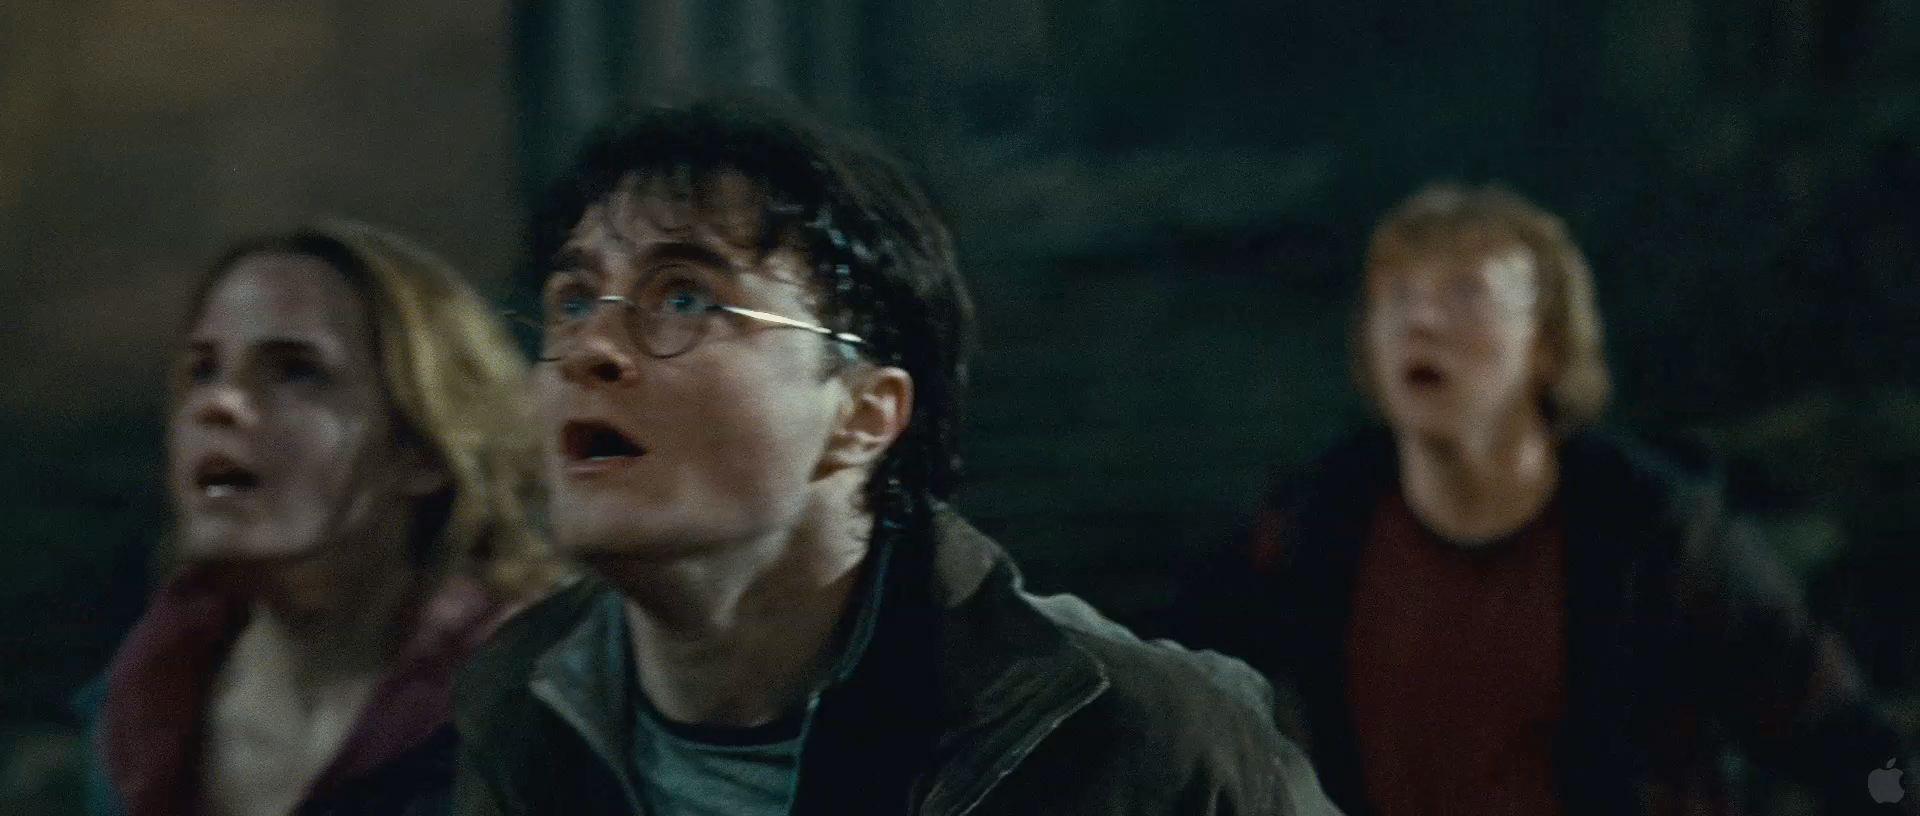 Harry Potter BlogHogwarts HP7 2 Trailer 63